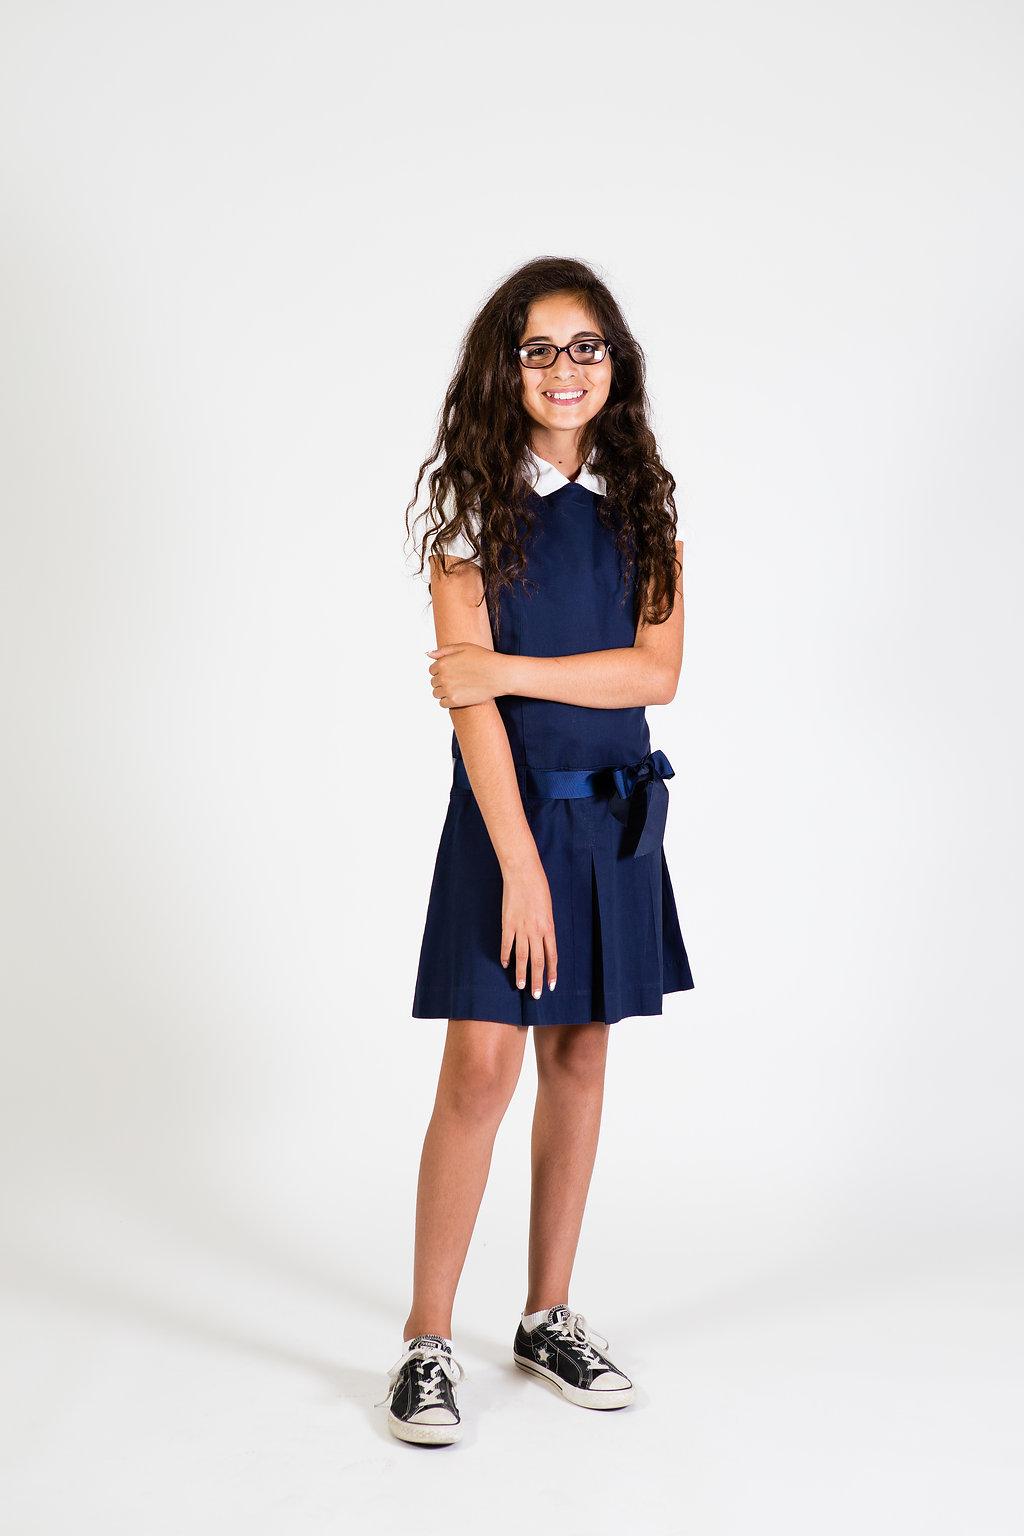 16JuneWCA_Uniforms077-Edit.jpg